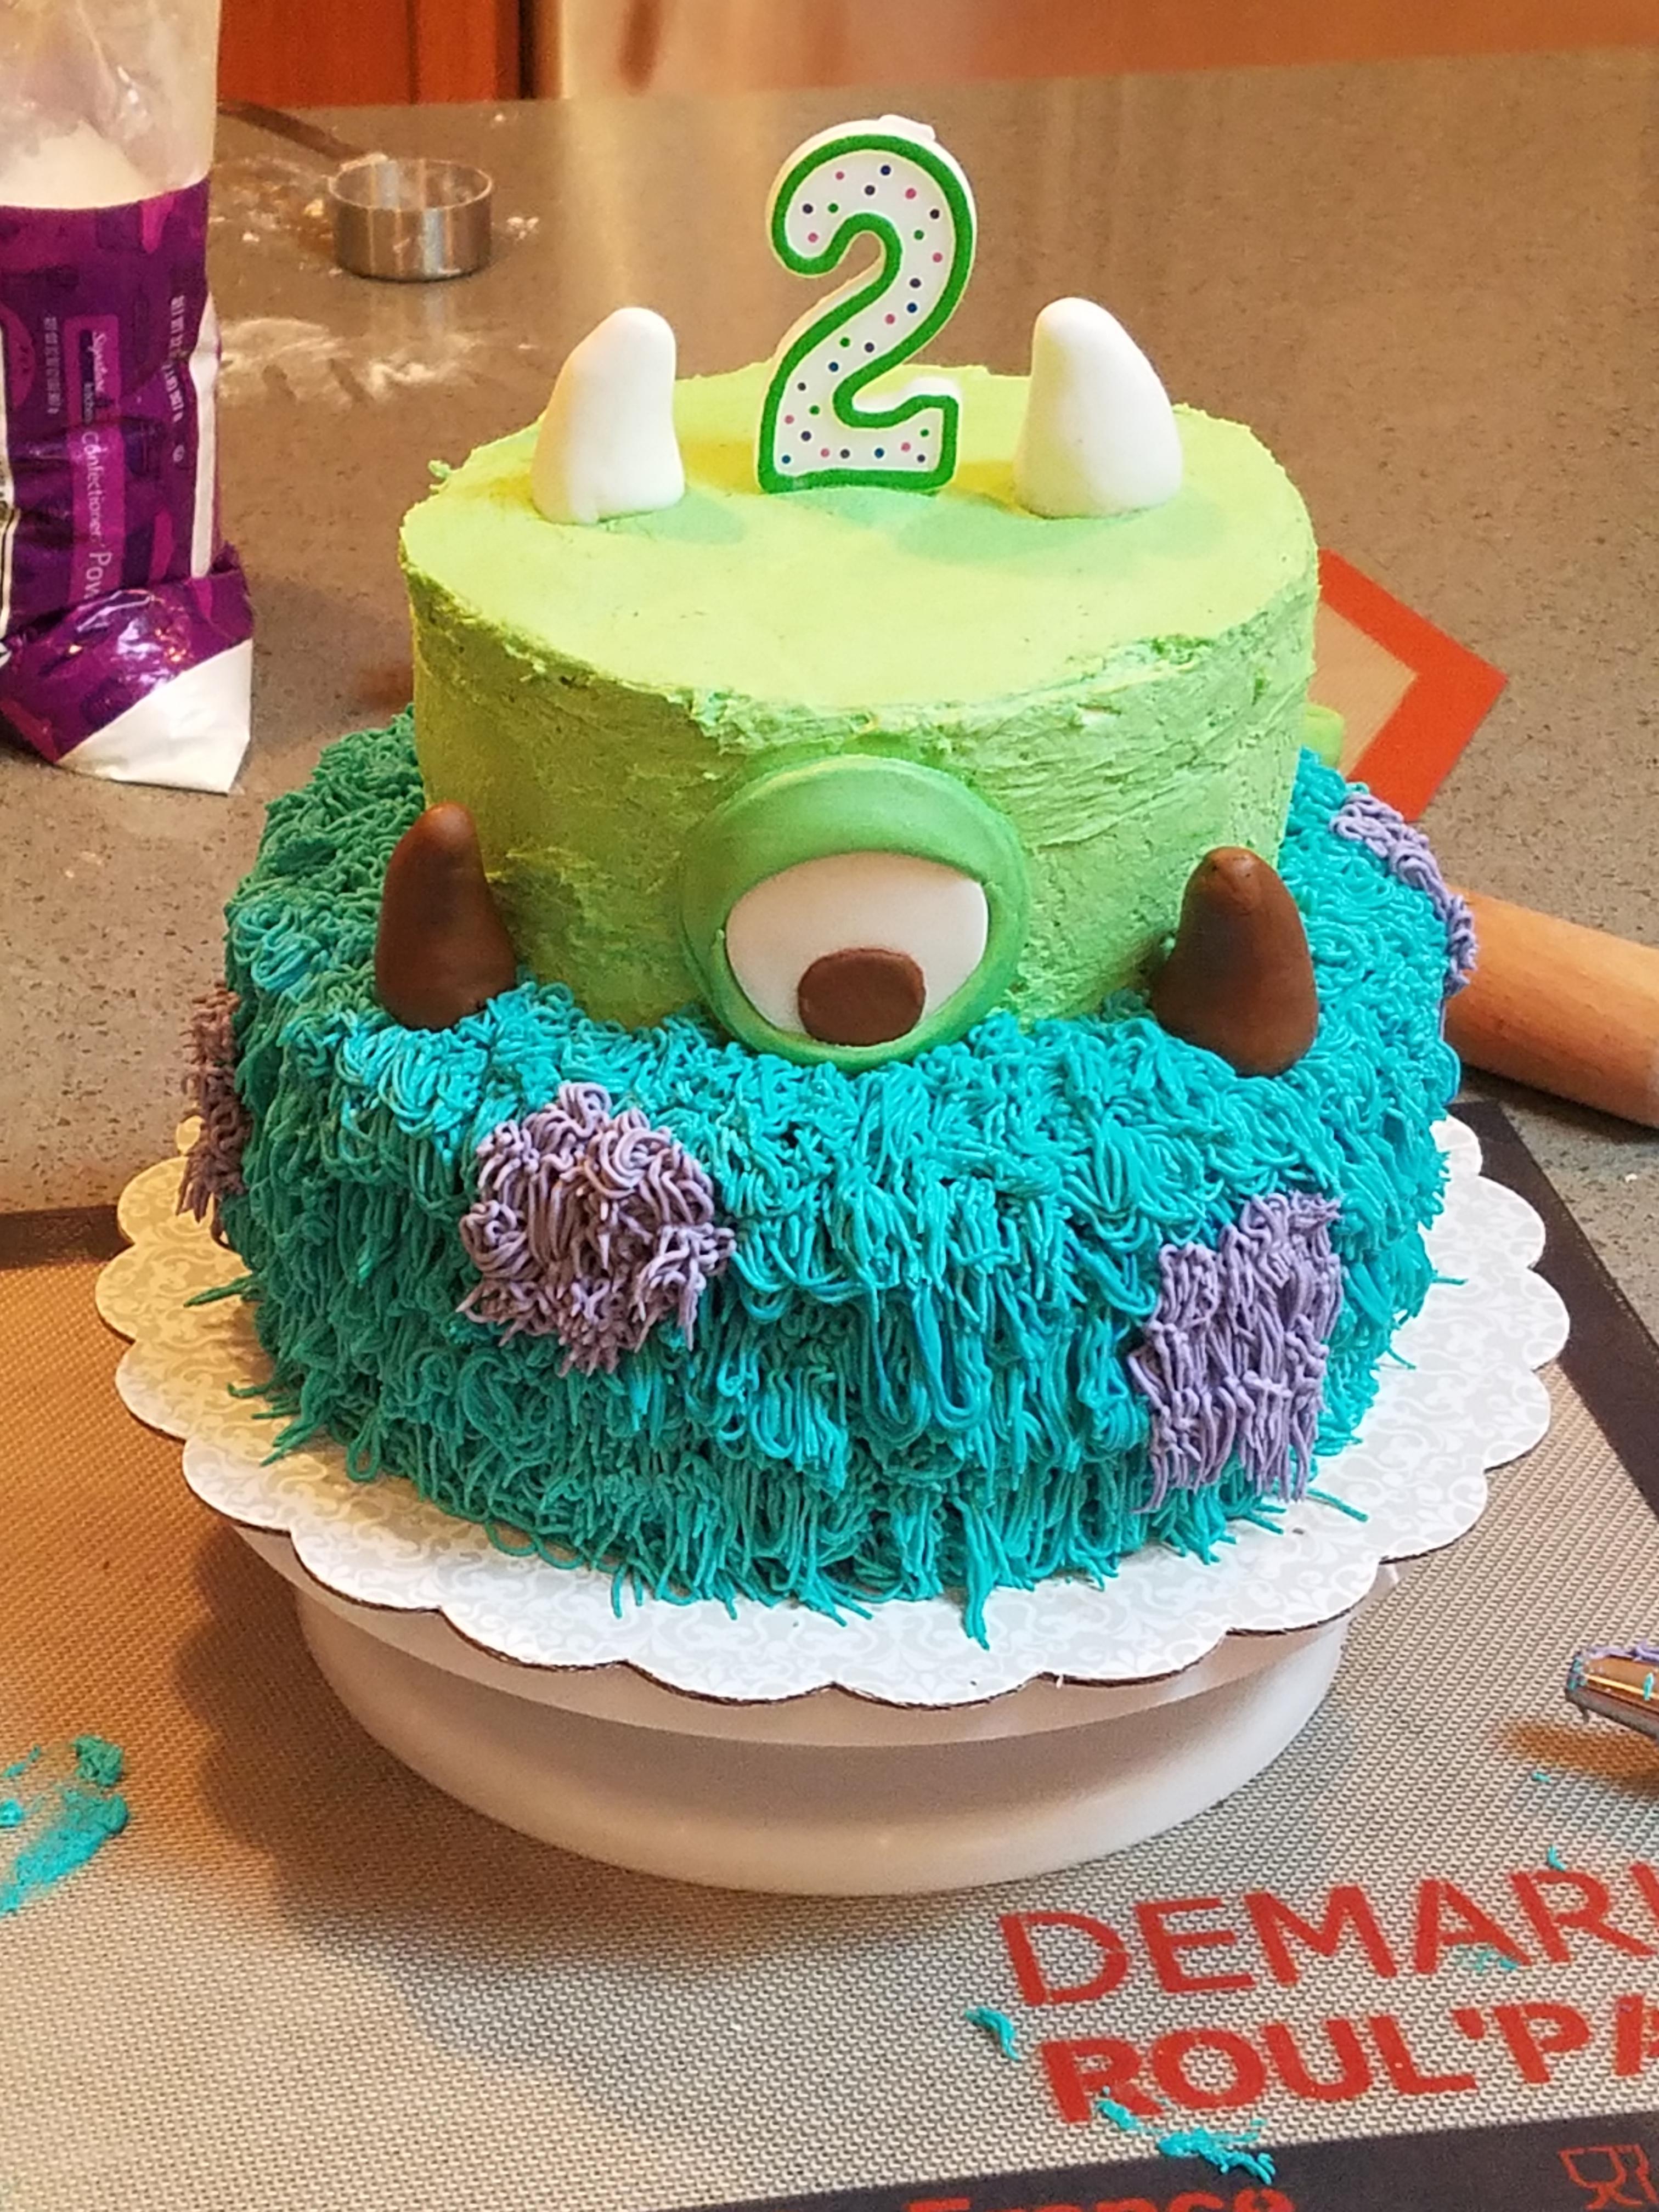 2 Year Old Birthday Cake : birthday, Birthday, Loves, Monsters, Cakedecorating